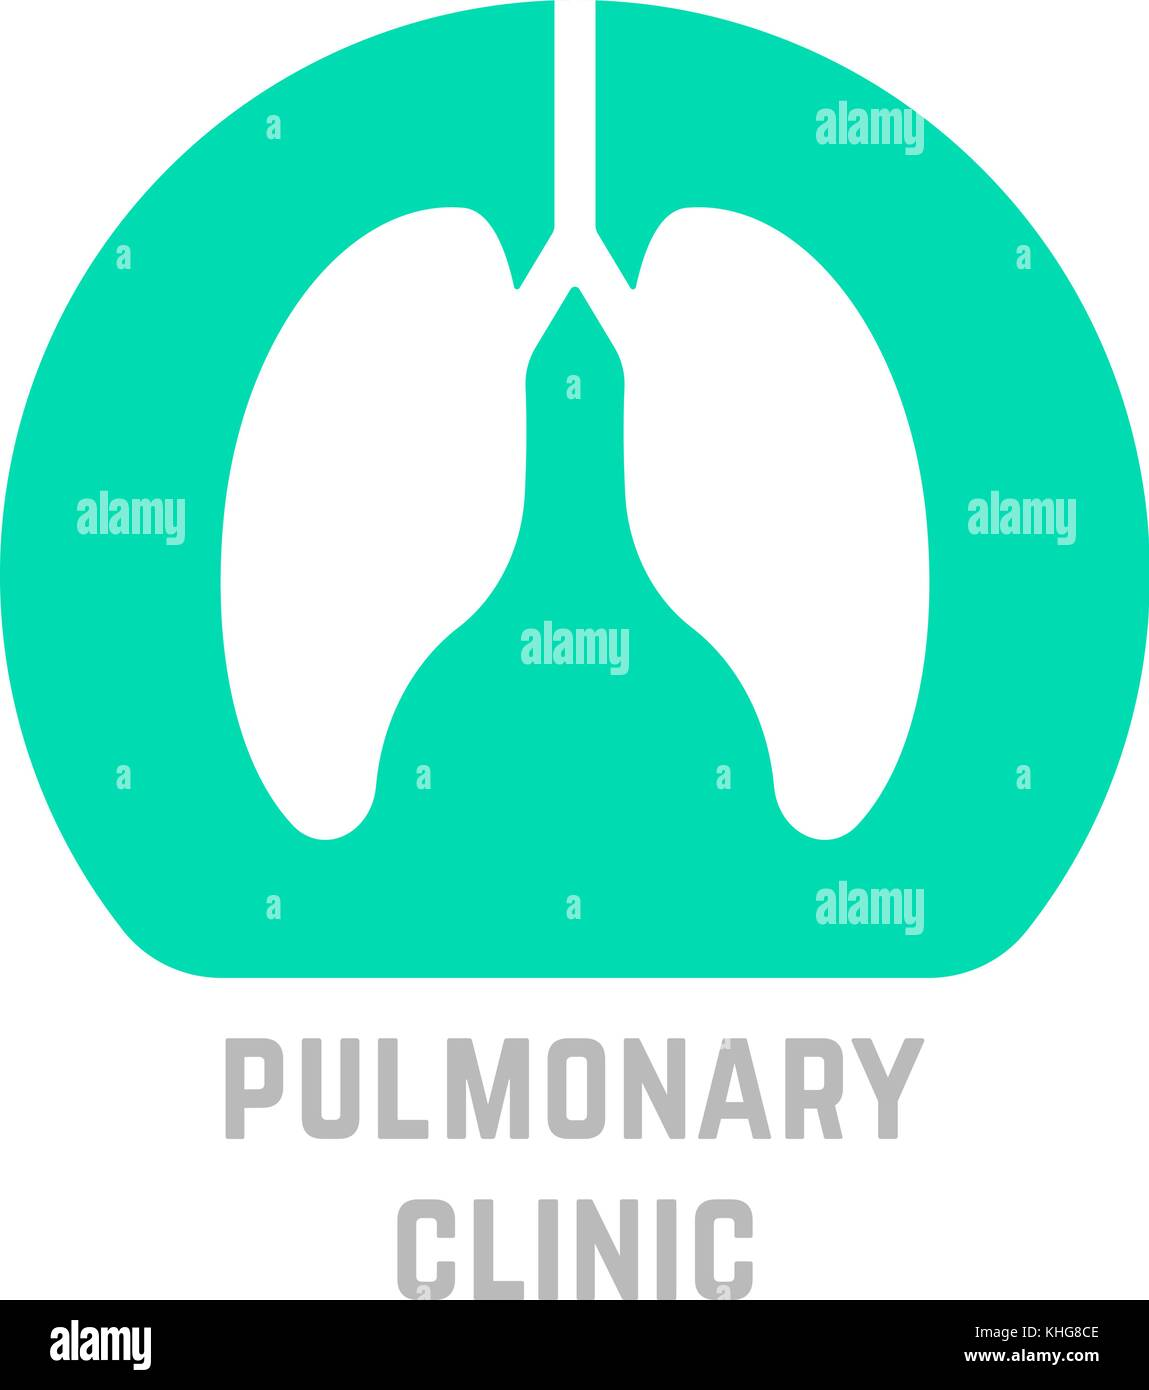 green simple pulmonary clinic logo - Stock Image